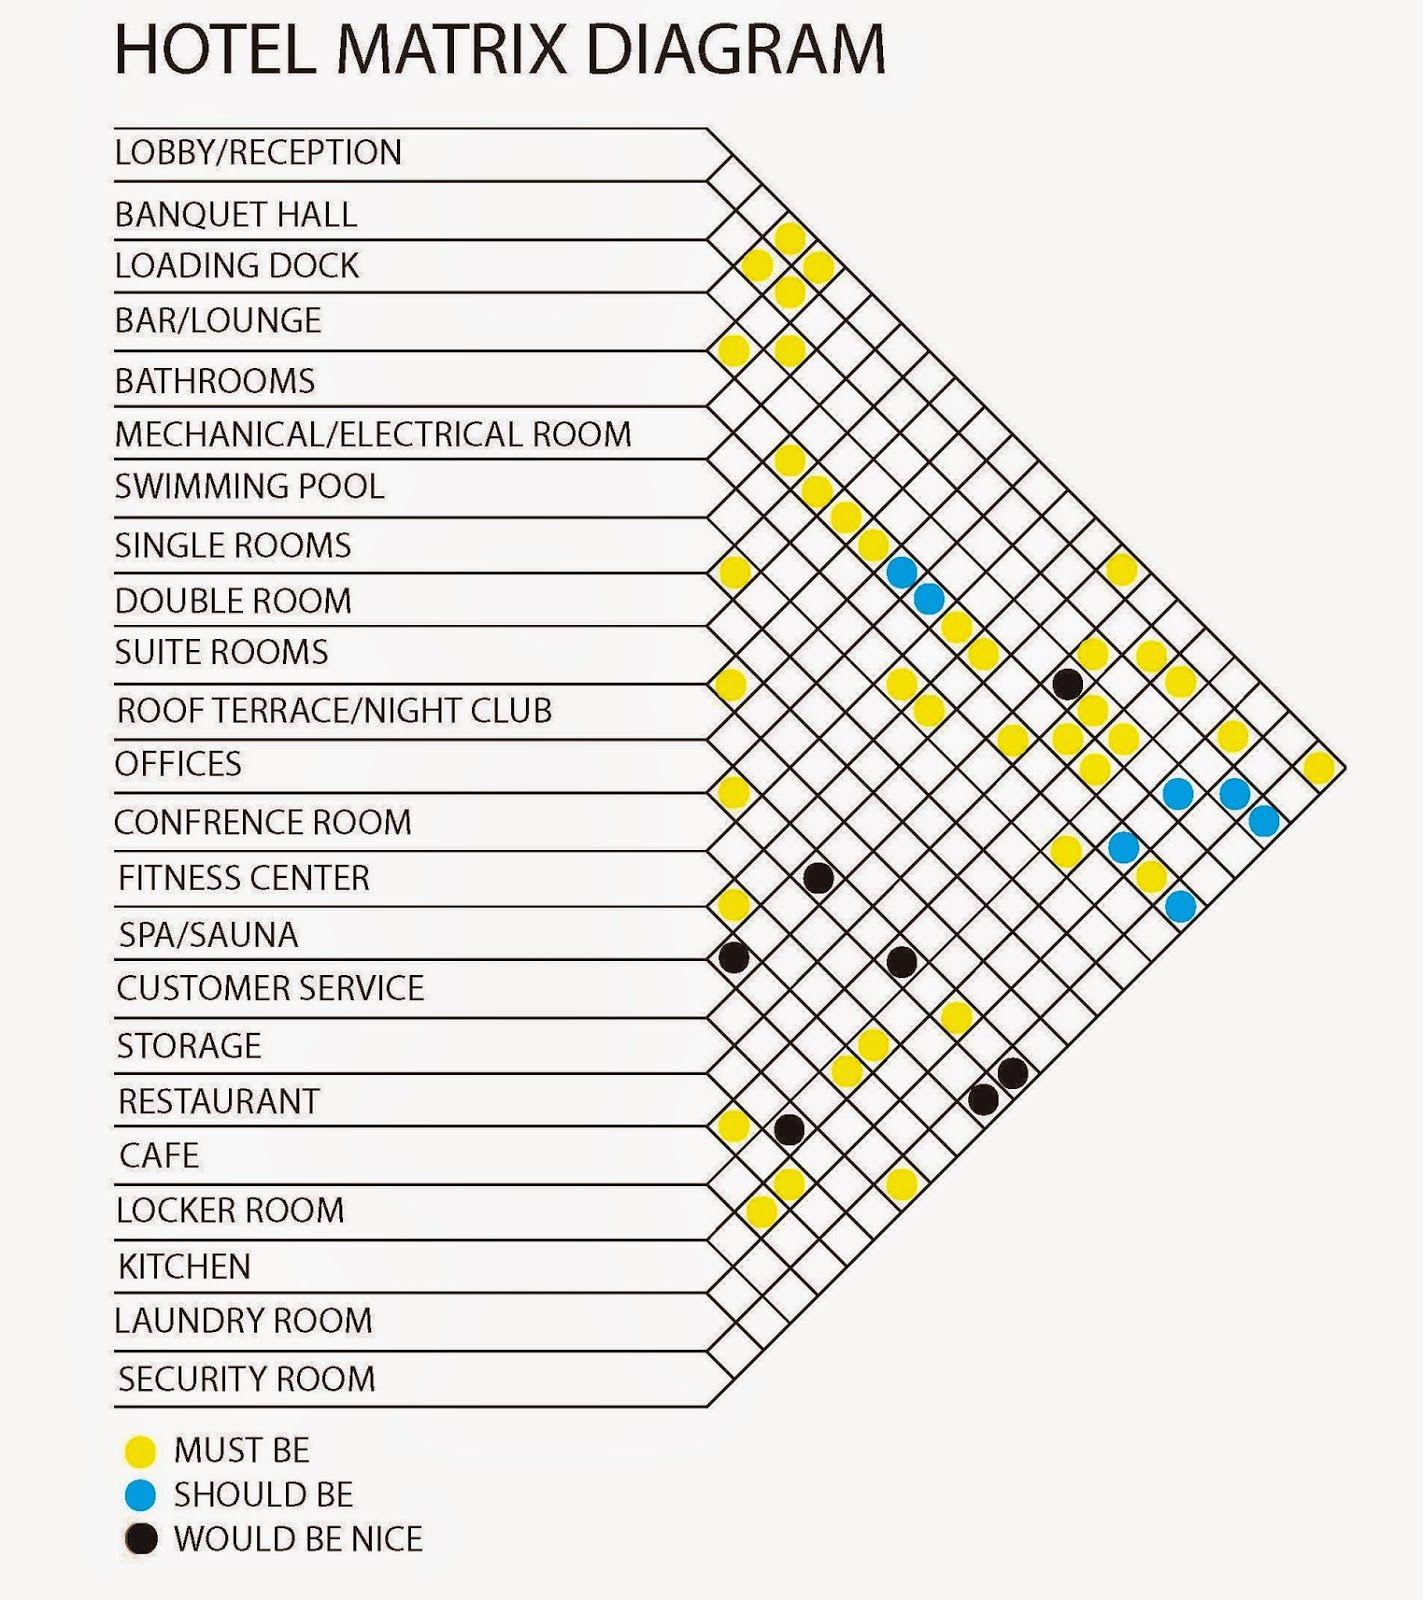 Hotel matrix diagram plano de massas i funcionograma pinterest resultado de imagem para bubble diagram hotel design ccuart Gallery